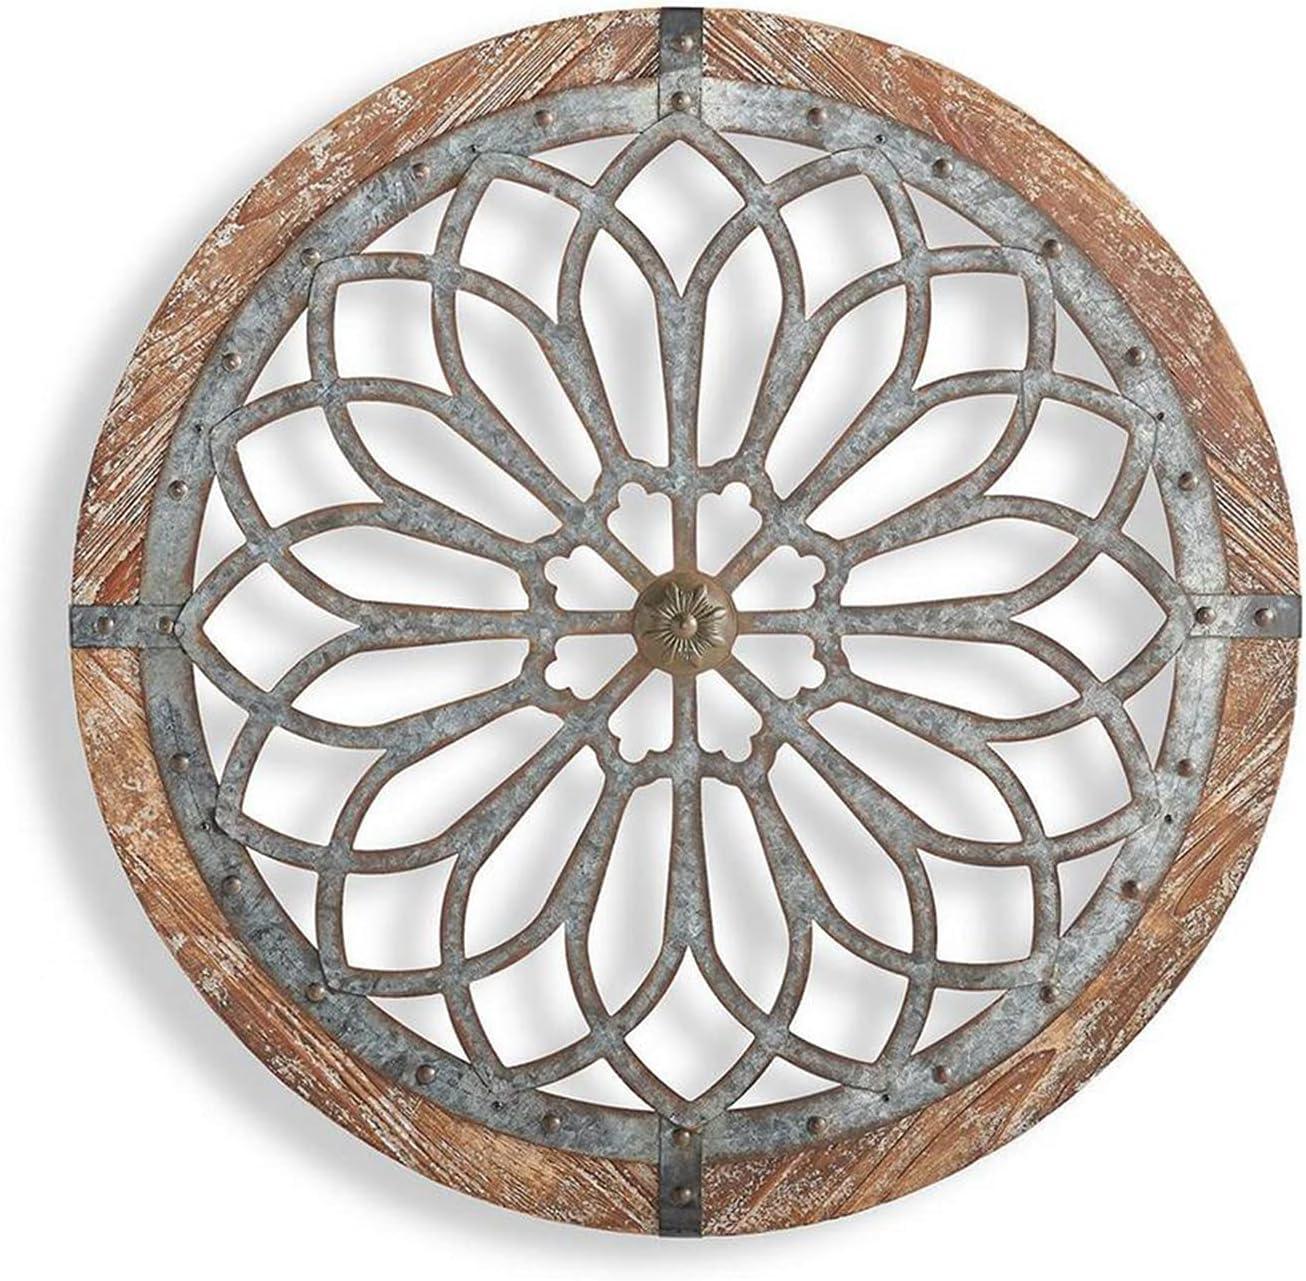 KHLRDK Heritage Round Wall Popularity Art Ornament Hanging Restaur Wooden Ranking TOP12